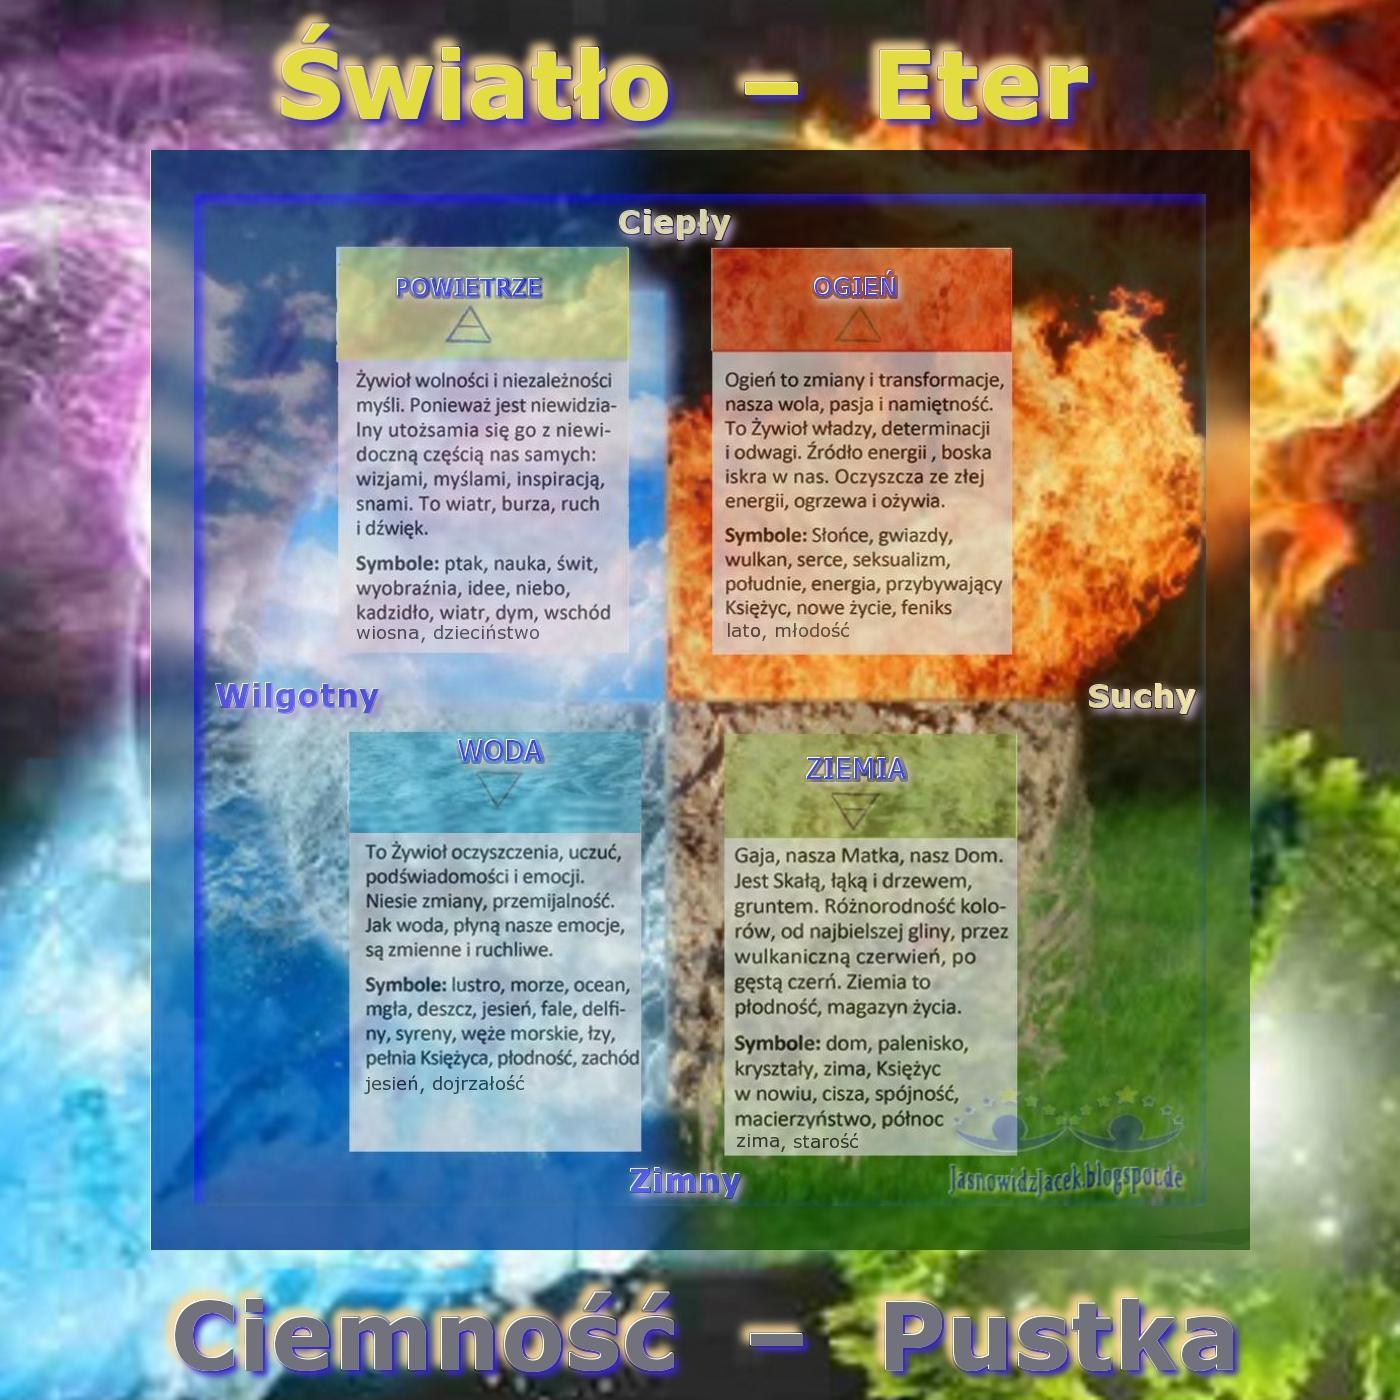 Zywioly - Iskra Boza Ogien Powietrze MESKA ENERGIA -  Woda Ziemia ZENSKA ENERGIA - DUCH i MATERIA - opis